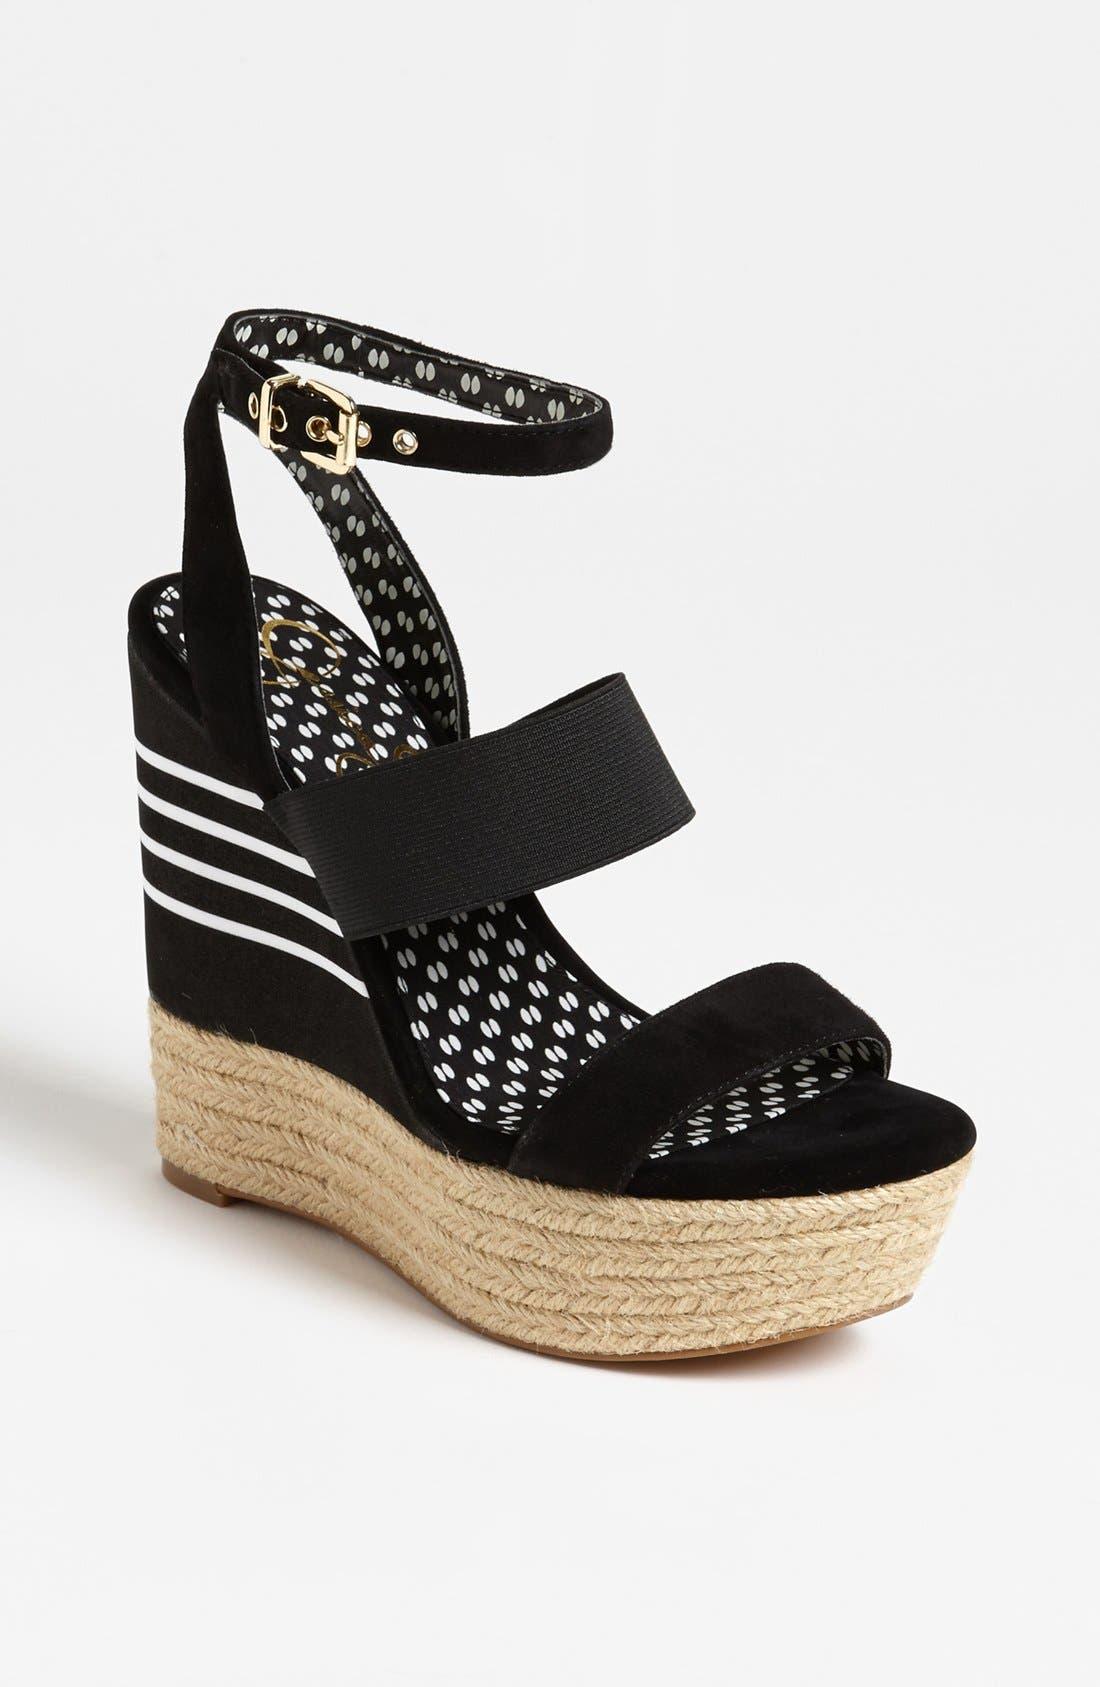 Alternate Image 1 Selected - Jessica Simpson 'Cosset' Sandal